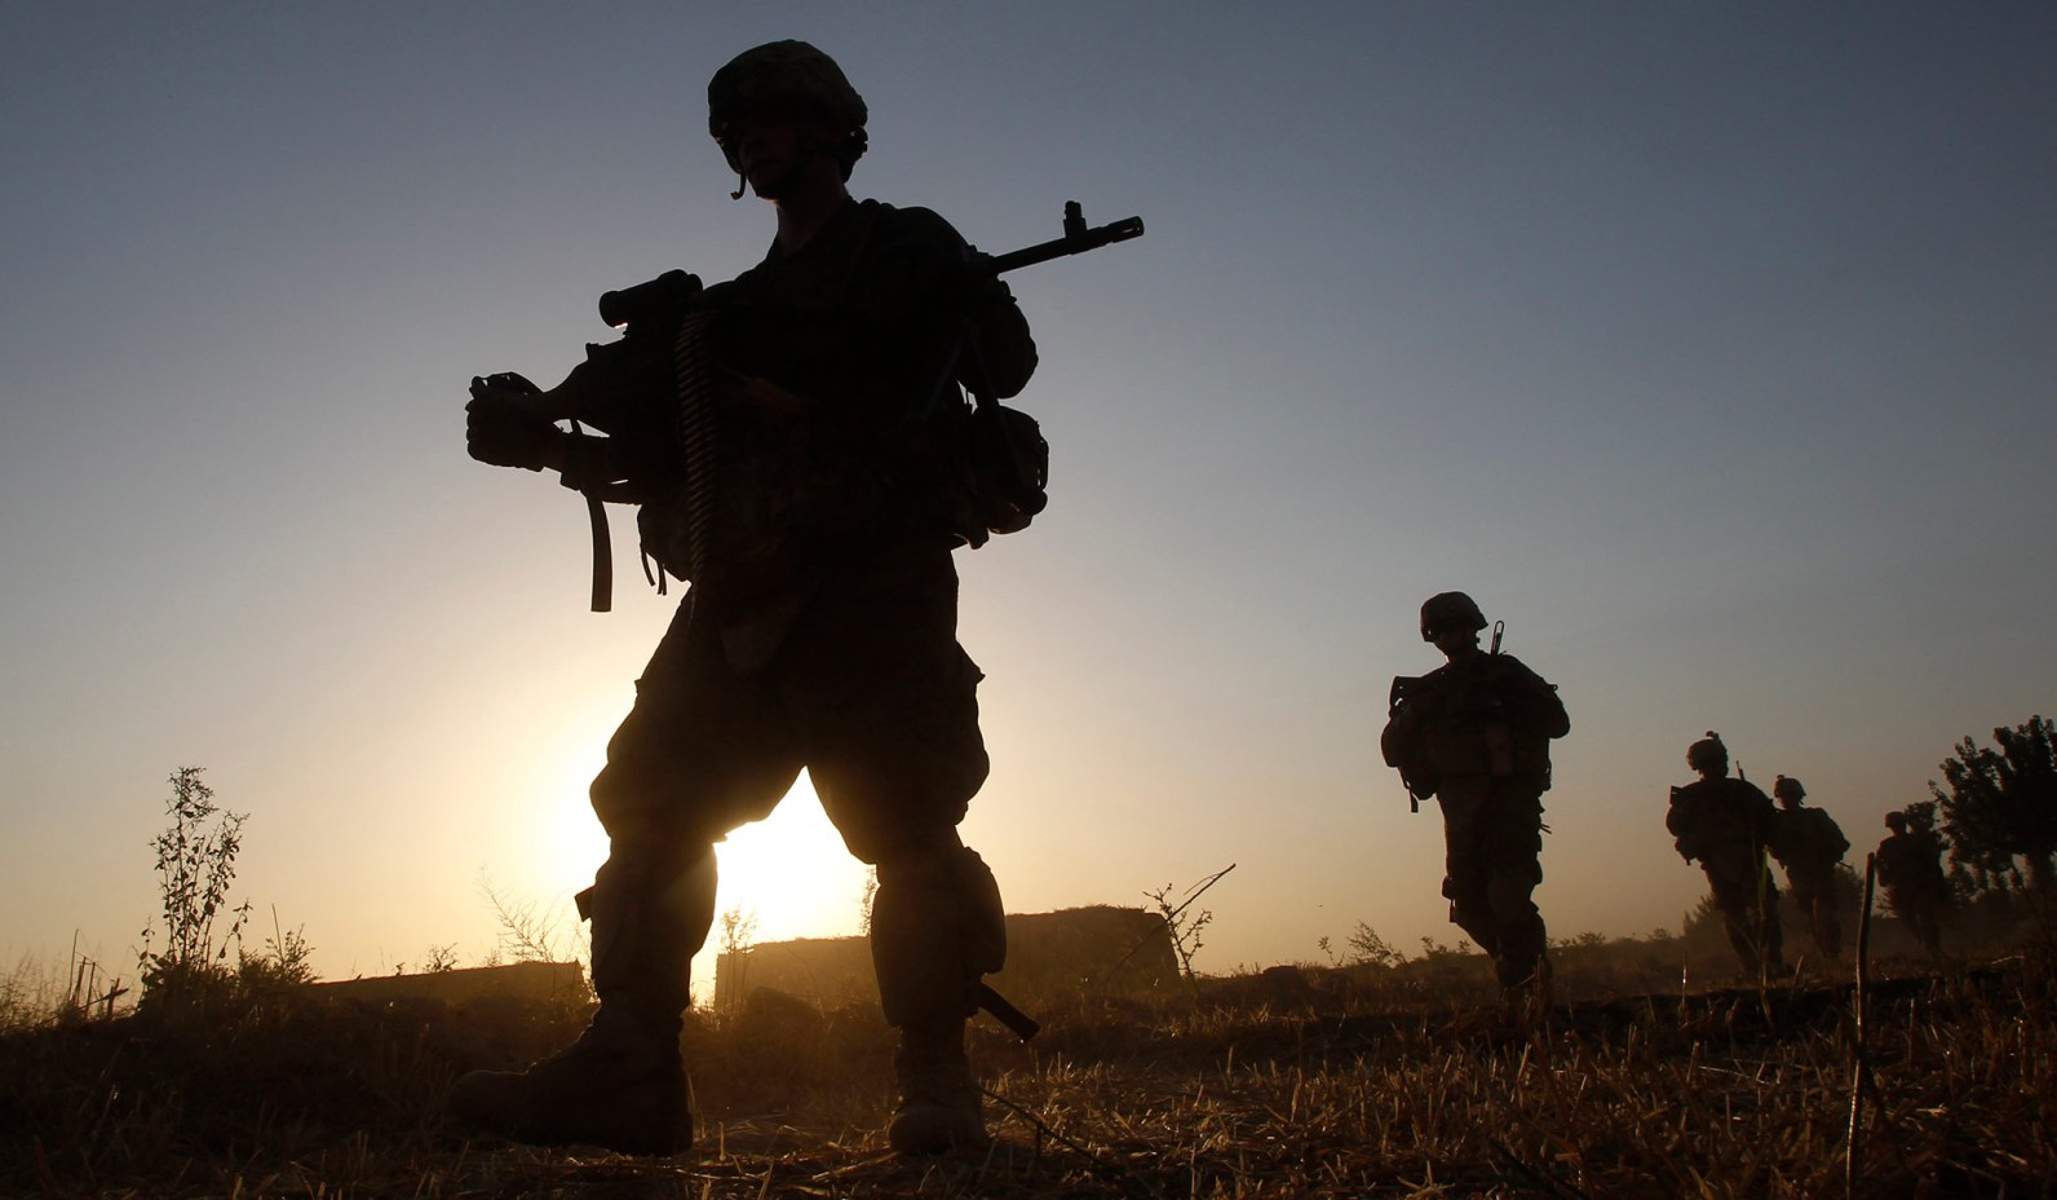 U.S. Army soldiers patrol in Kandahar Province, Afghanistan, in 2011. (Baz Ratner/Reuters)